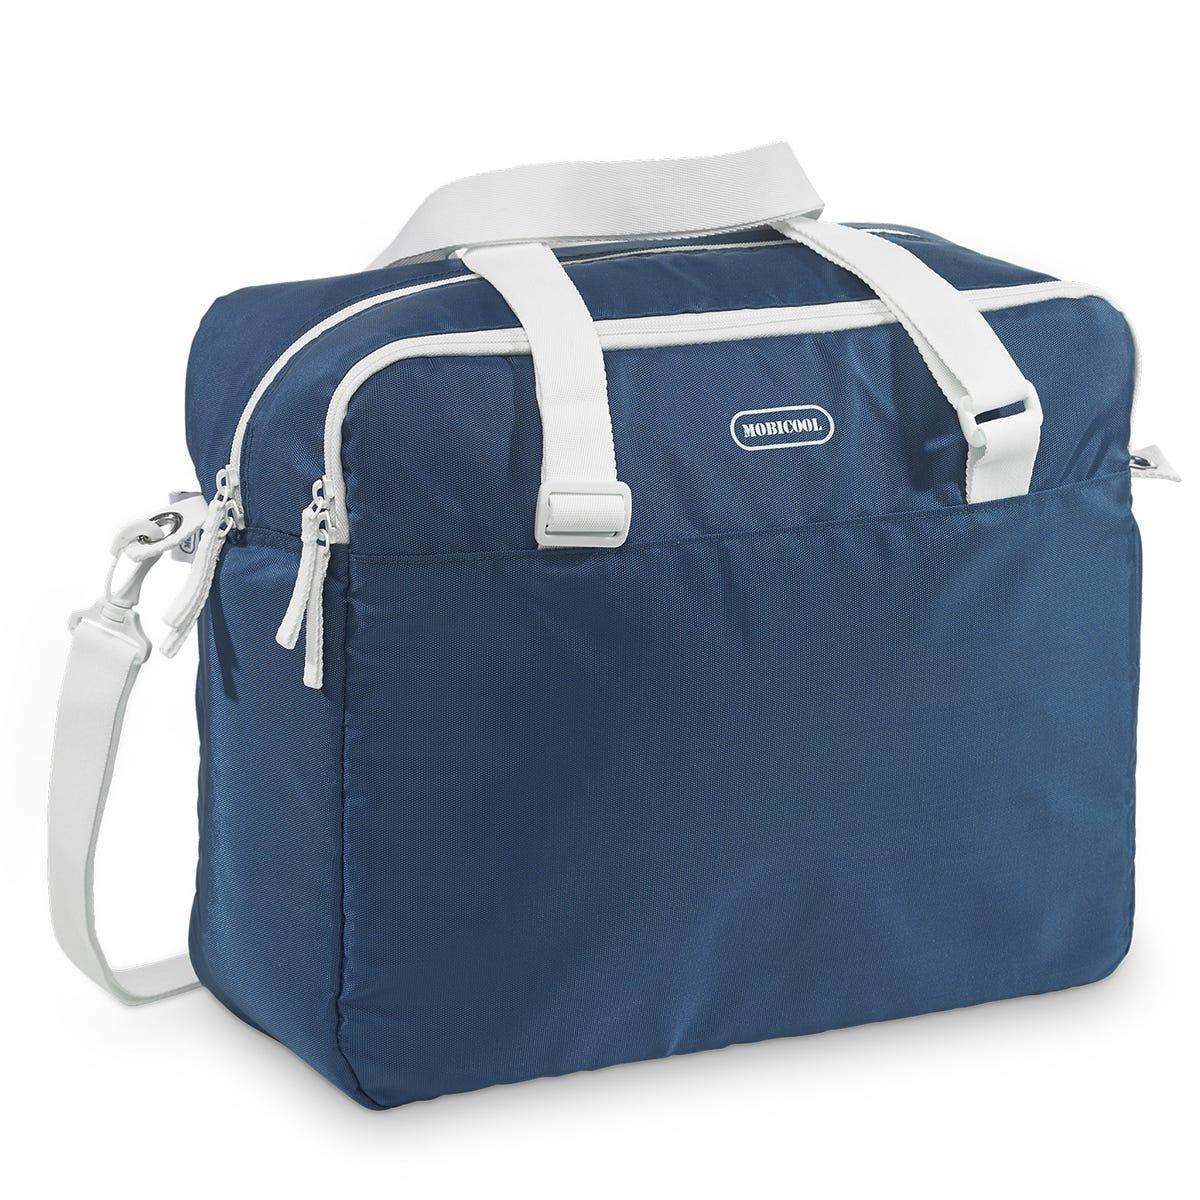 Mobicool Sail 25 Passive Cool Bag - 24 Litre